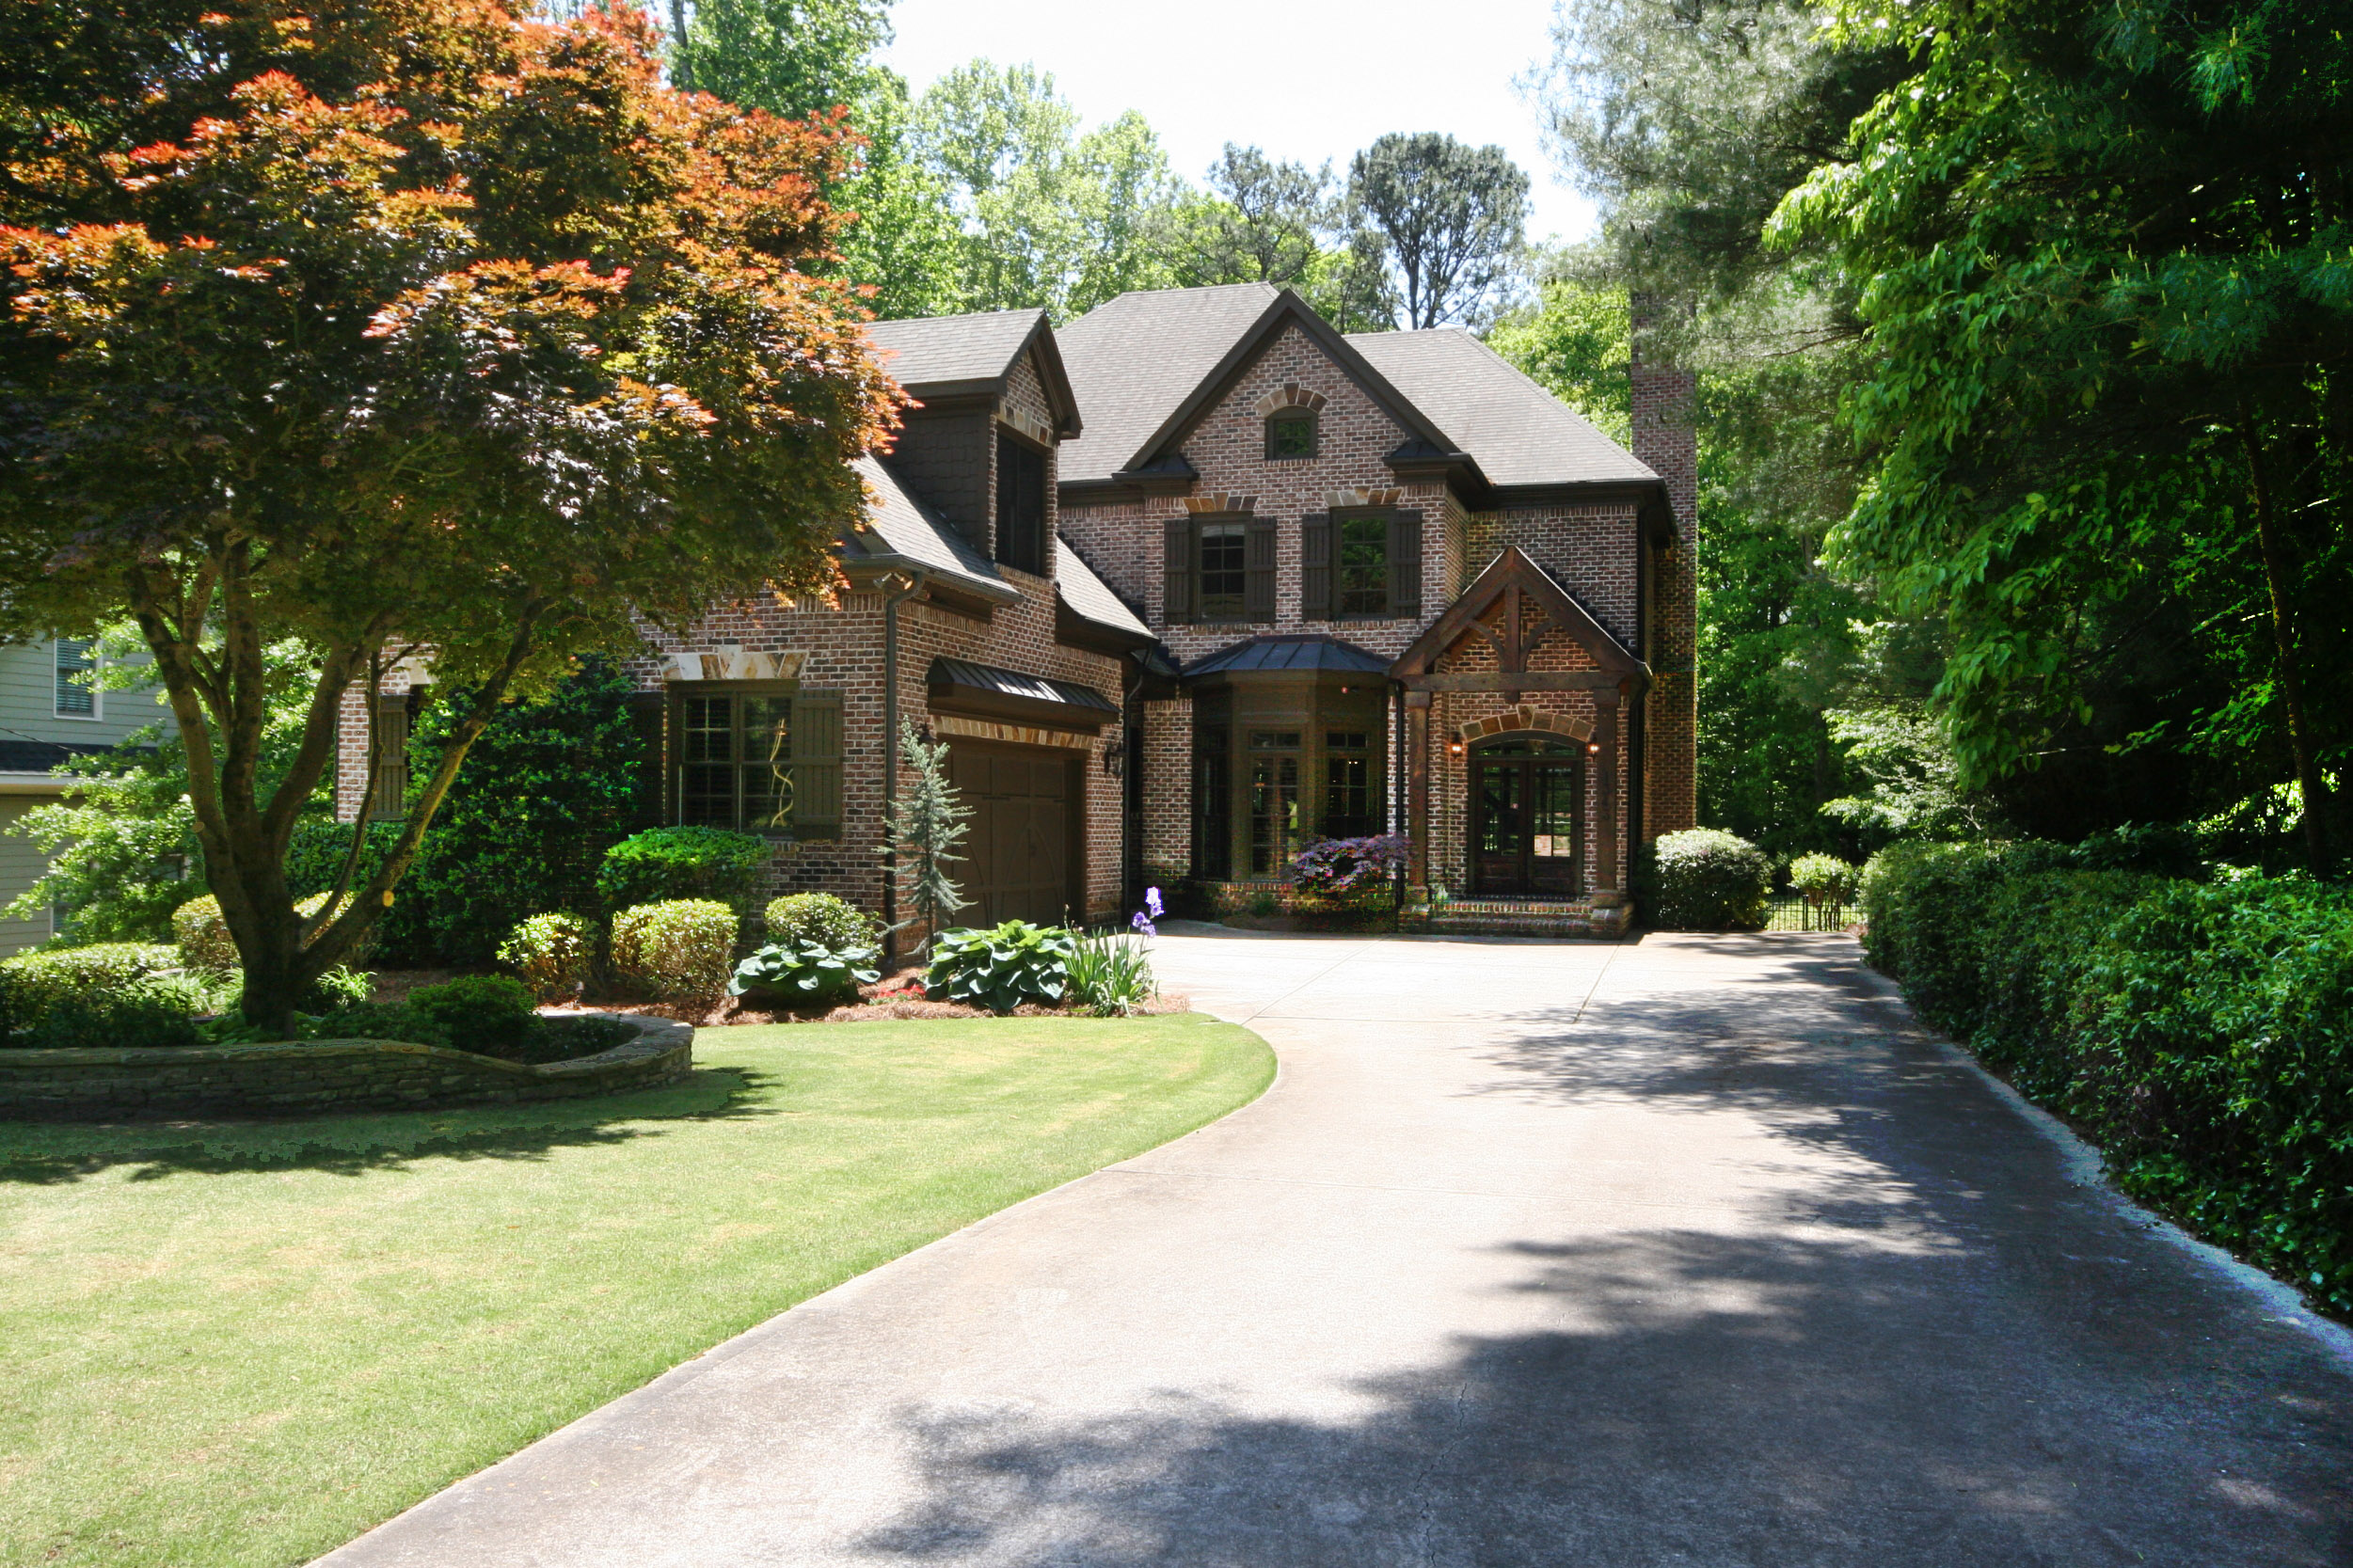 Atlanta Area Real Estate Listing Availability Search Our